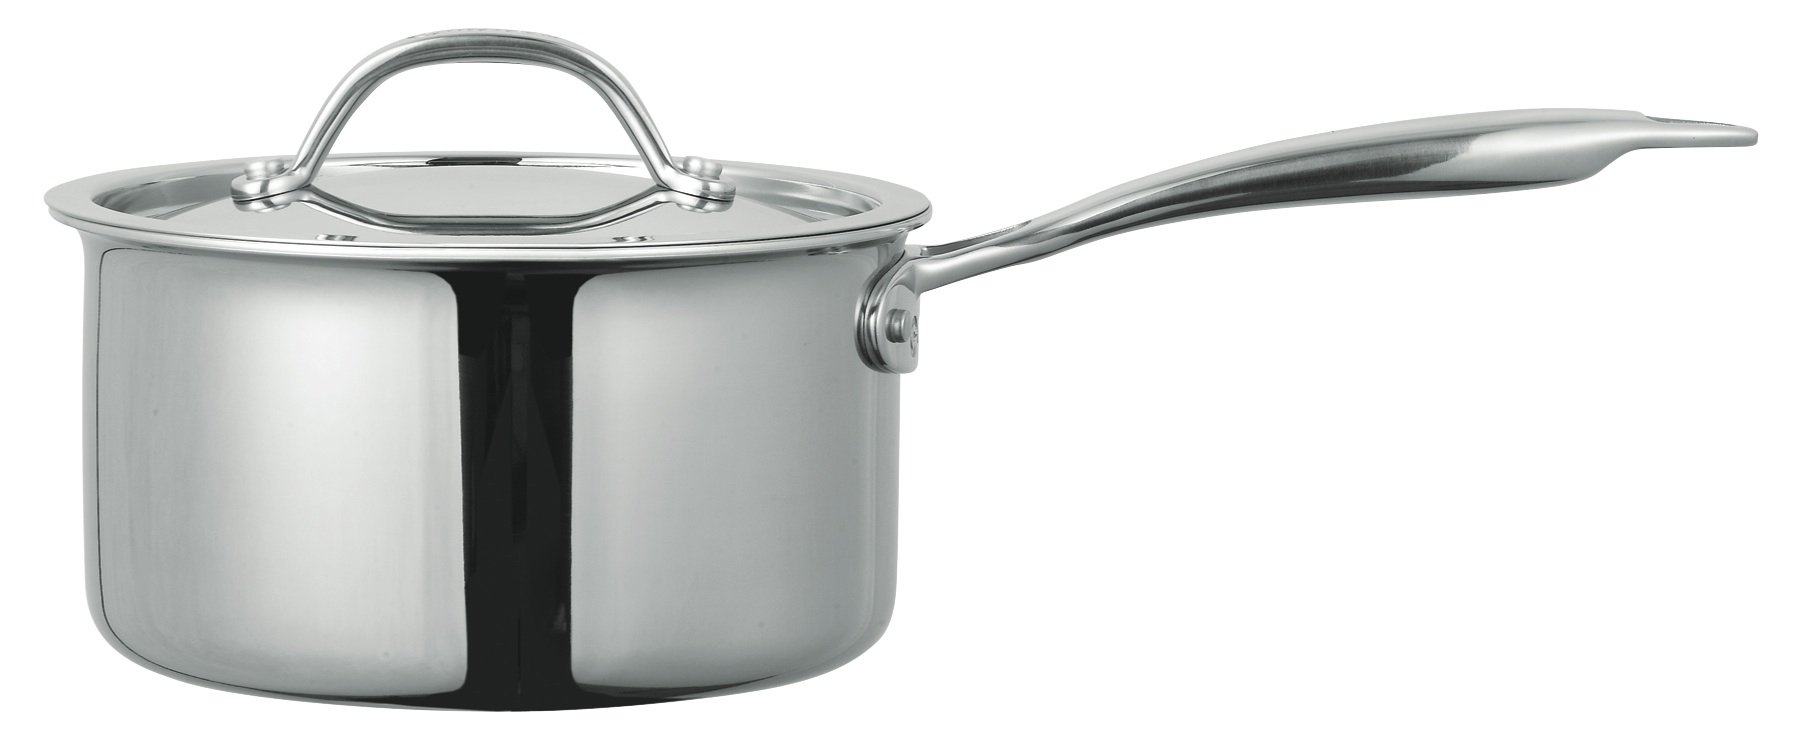 Cuisinox POT-418 Super Elite 3 Quart Covered Tri-Ply Bonded Saucepan, Stainless Steel